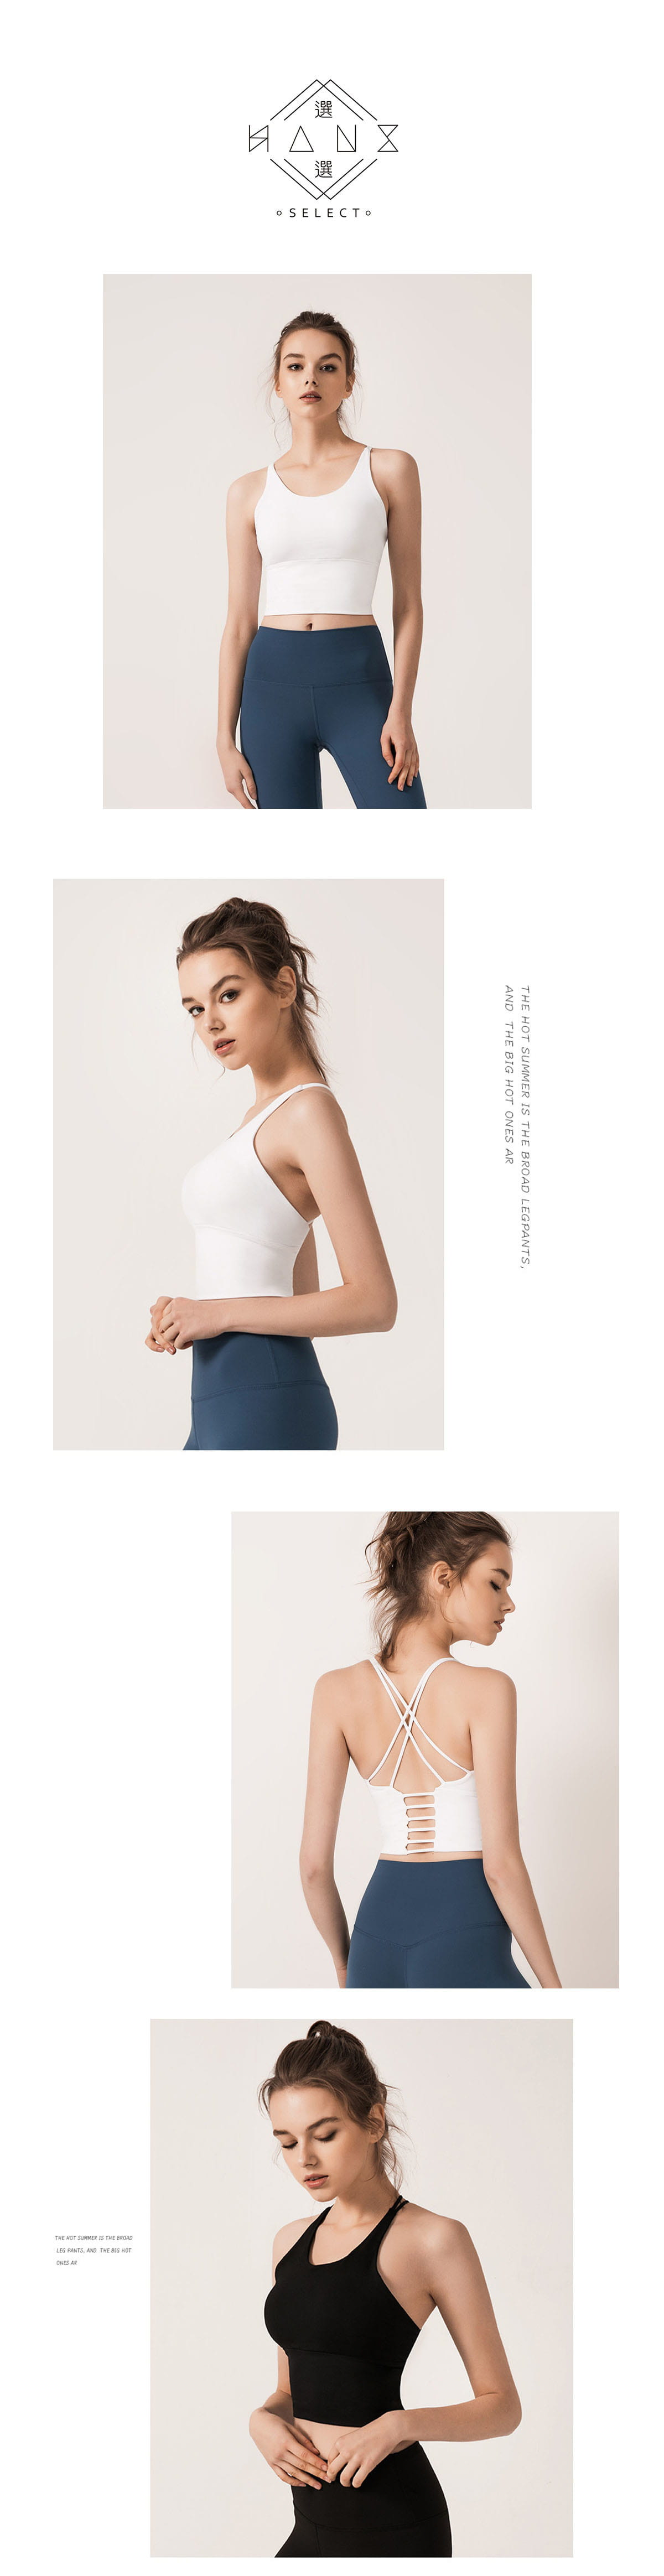 【Hans Select】純色美肌背心式運動內衣 1